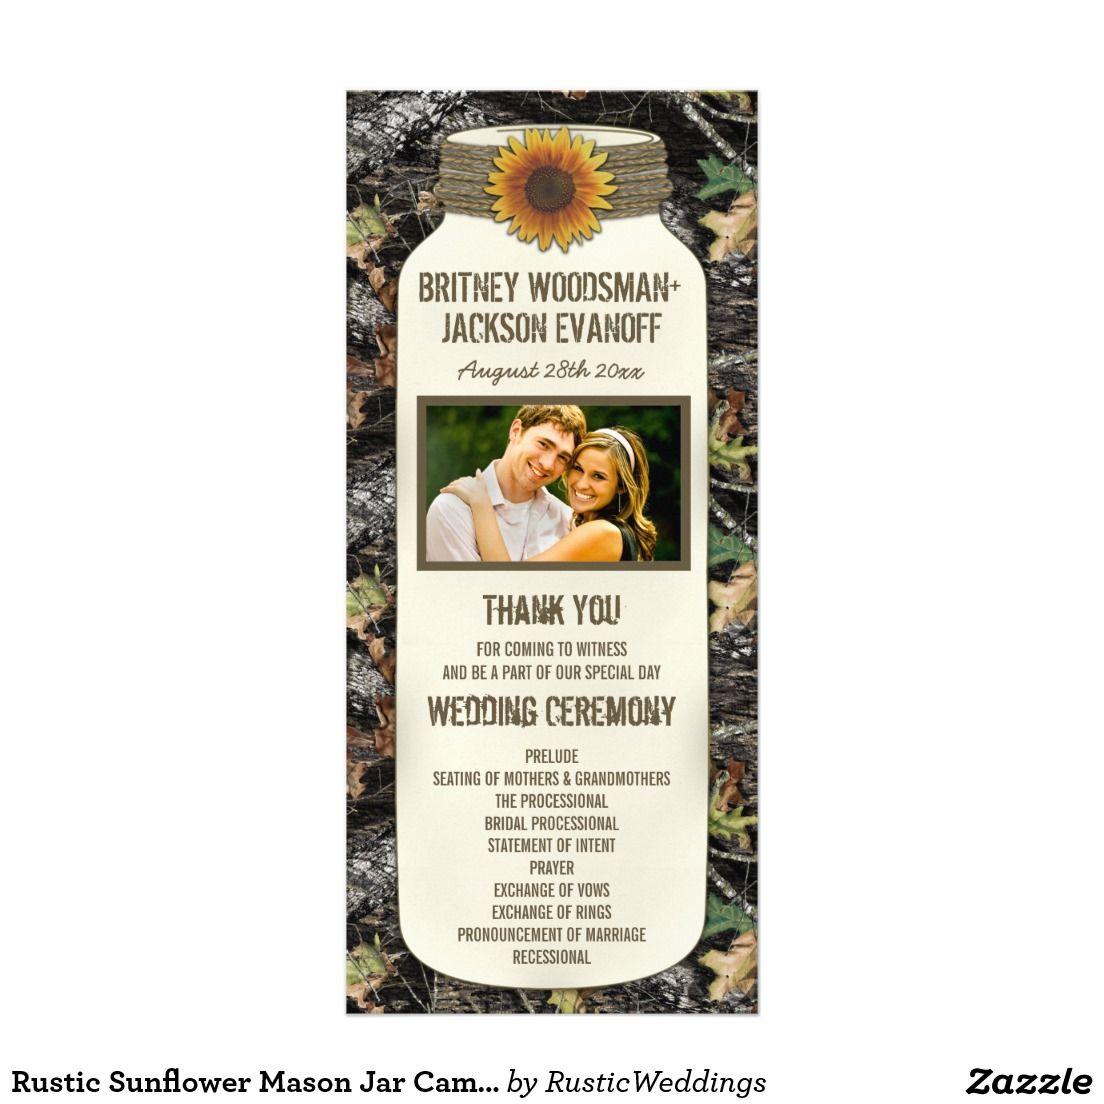 WEDDING PROGRAM PHOTO Rustic Chic Sunflower Mason Jar Camo ...